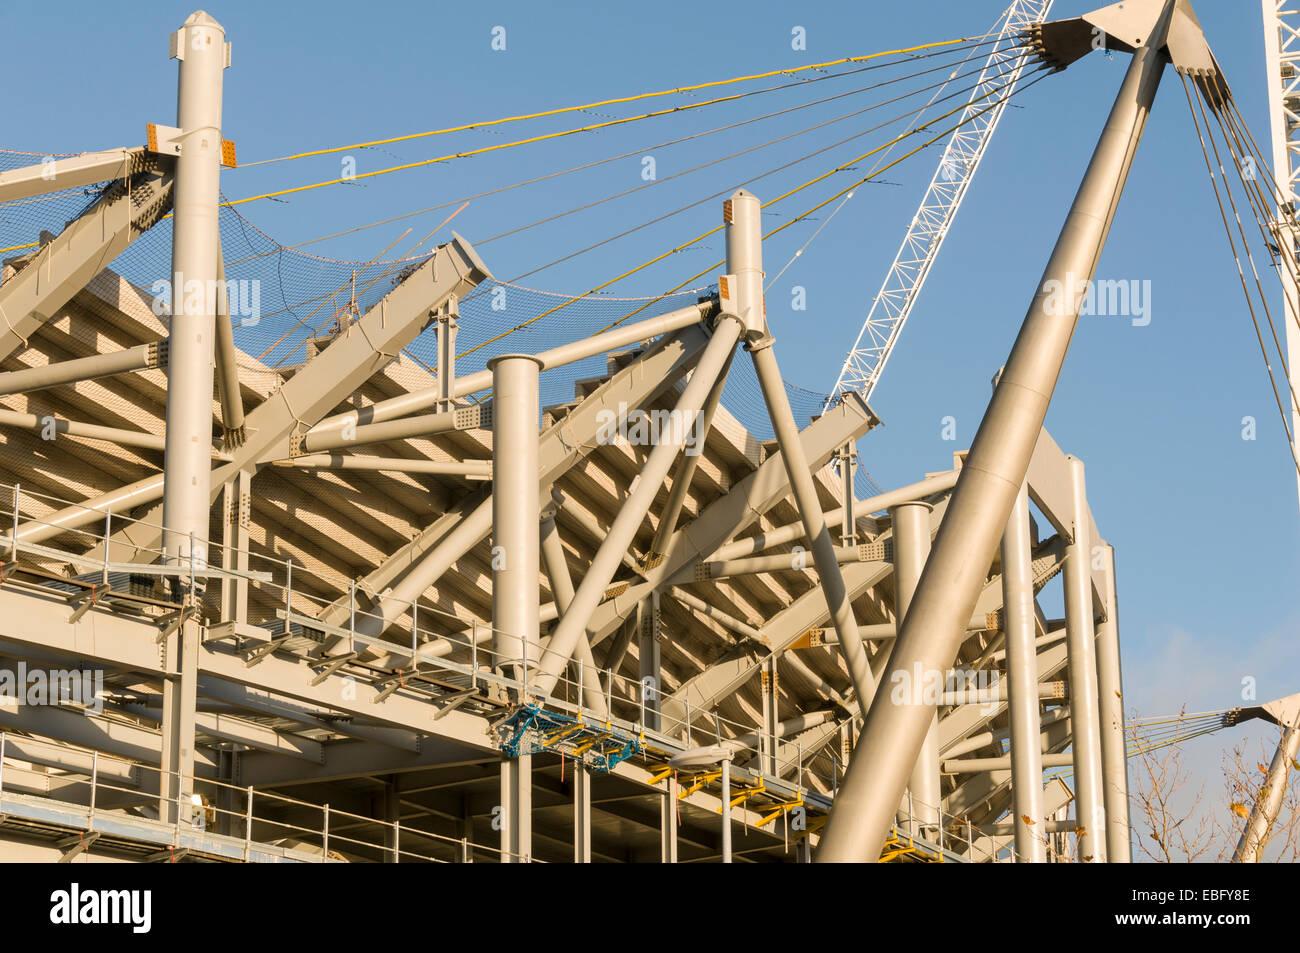 Steelwork on the City of Manchester Stadium (Etihad Stadium) expansion works, Clayton, Manchester, England, UK. - Stock Image